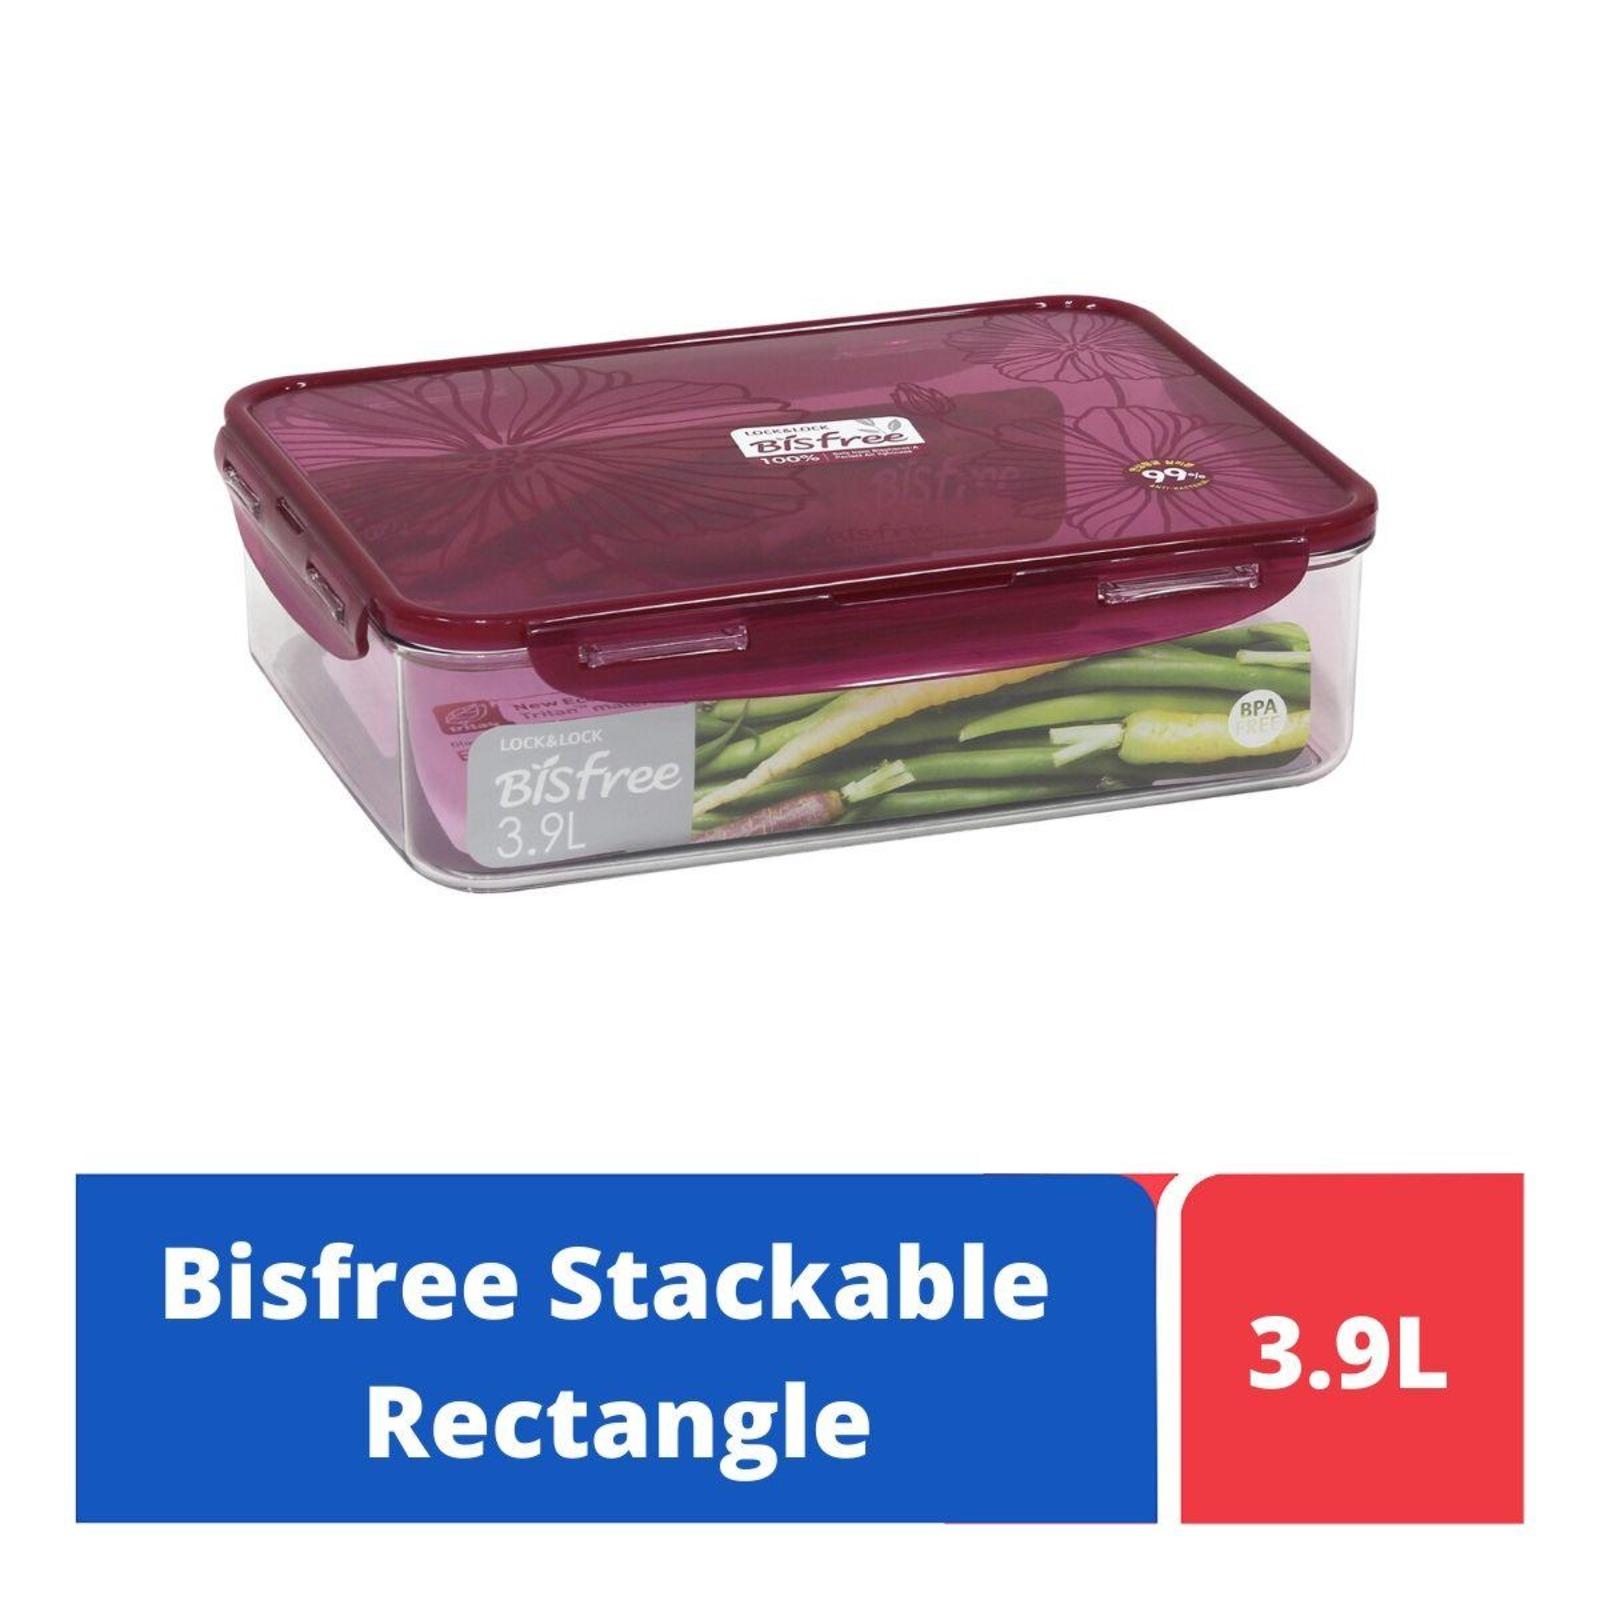 LOCK&LOCK Bisfree Food Container 3.9L - Red